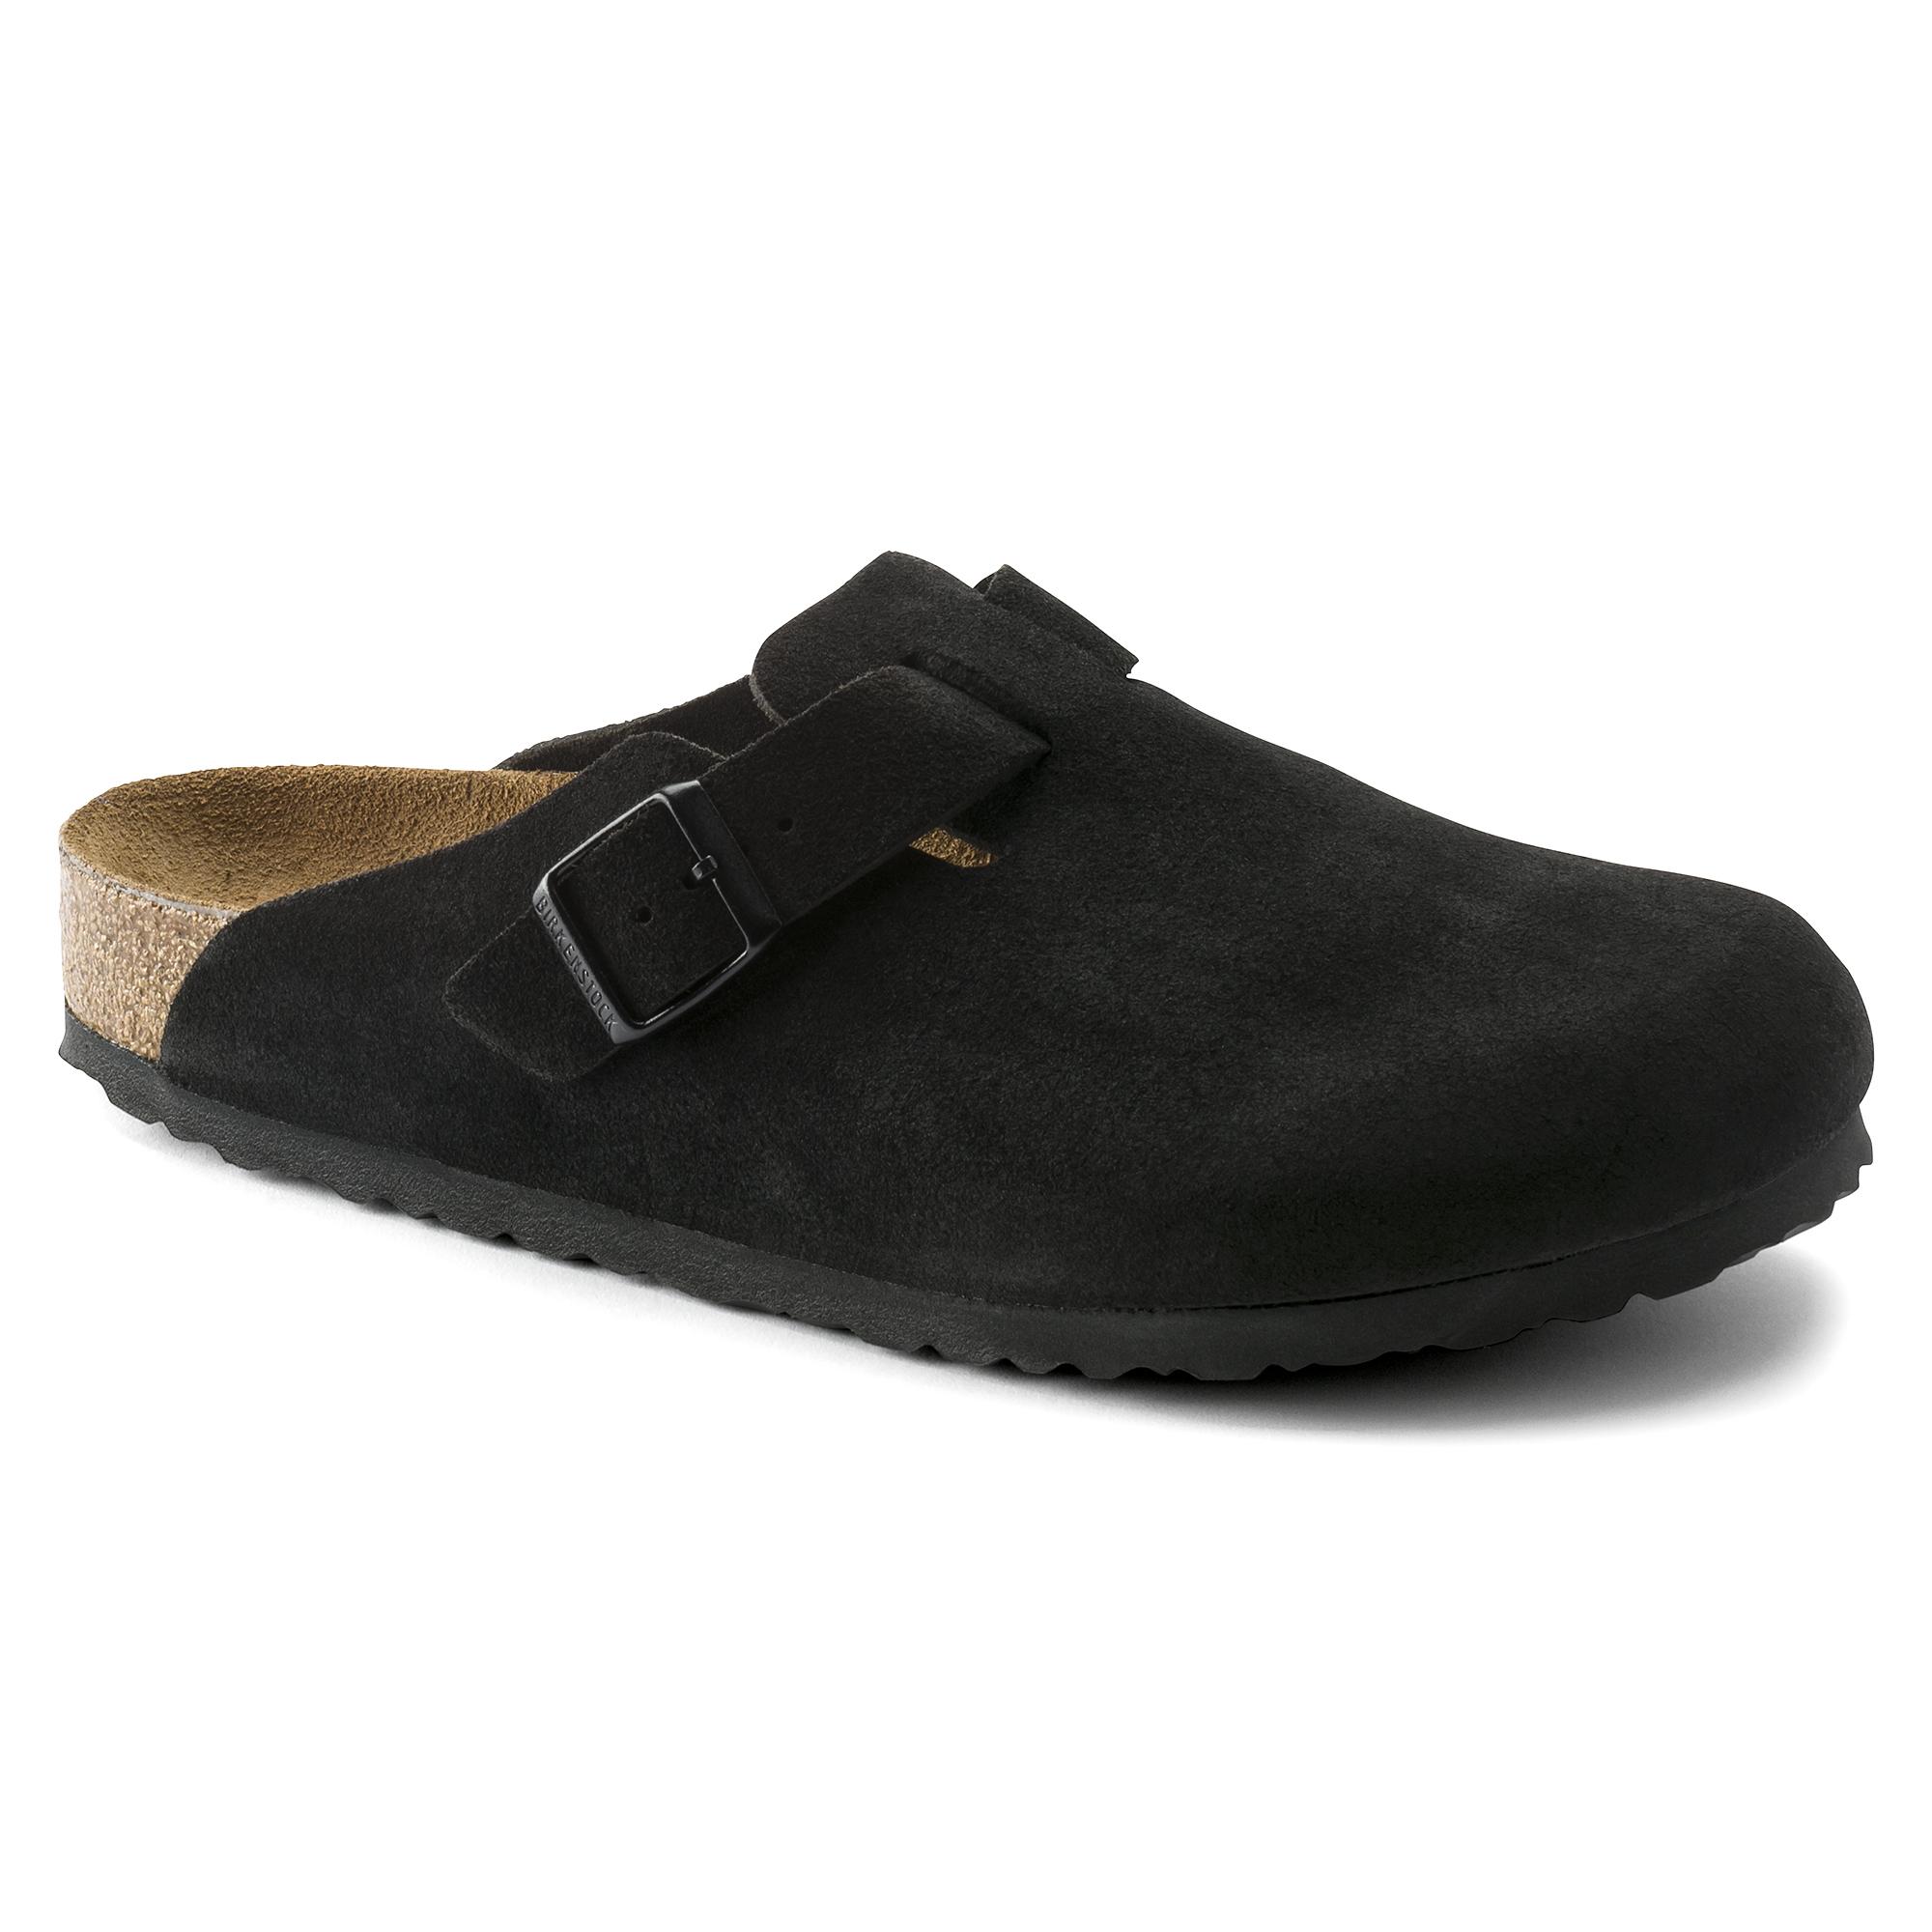 Birkenstock Boston black